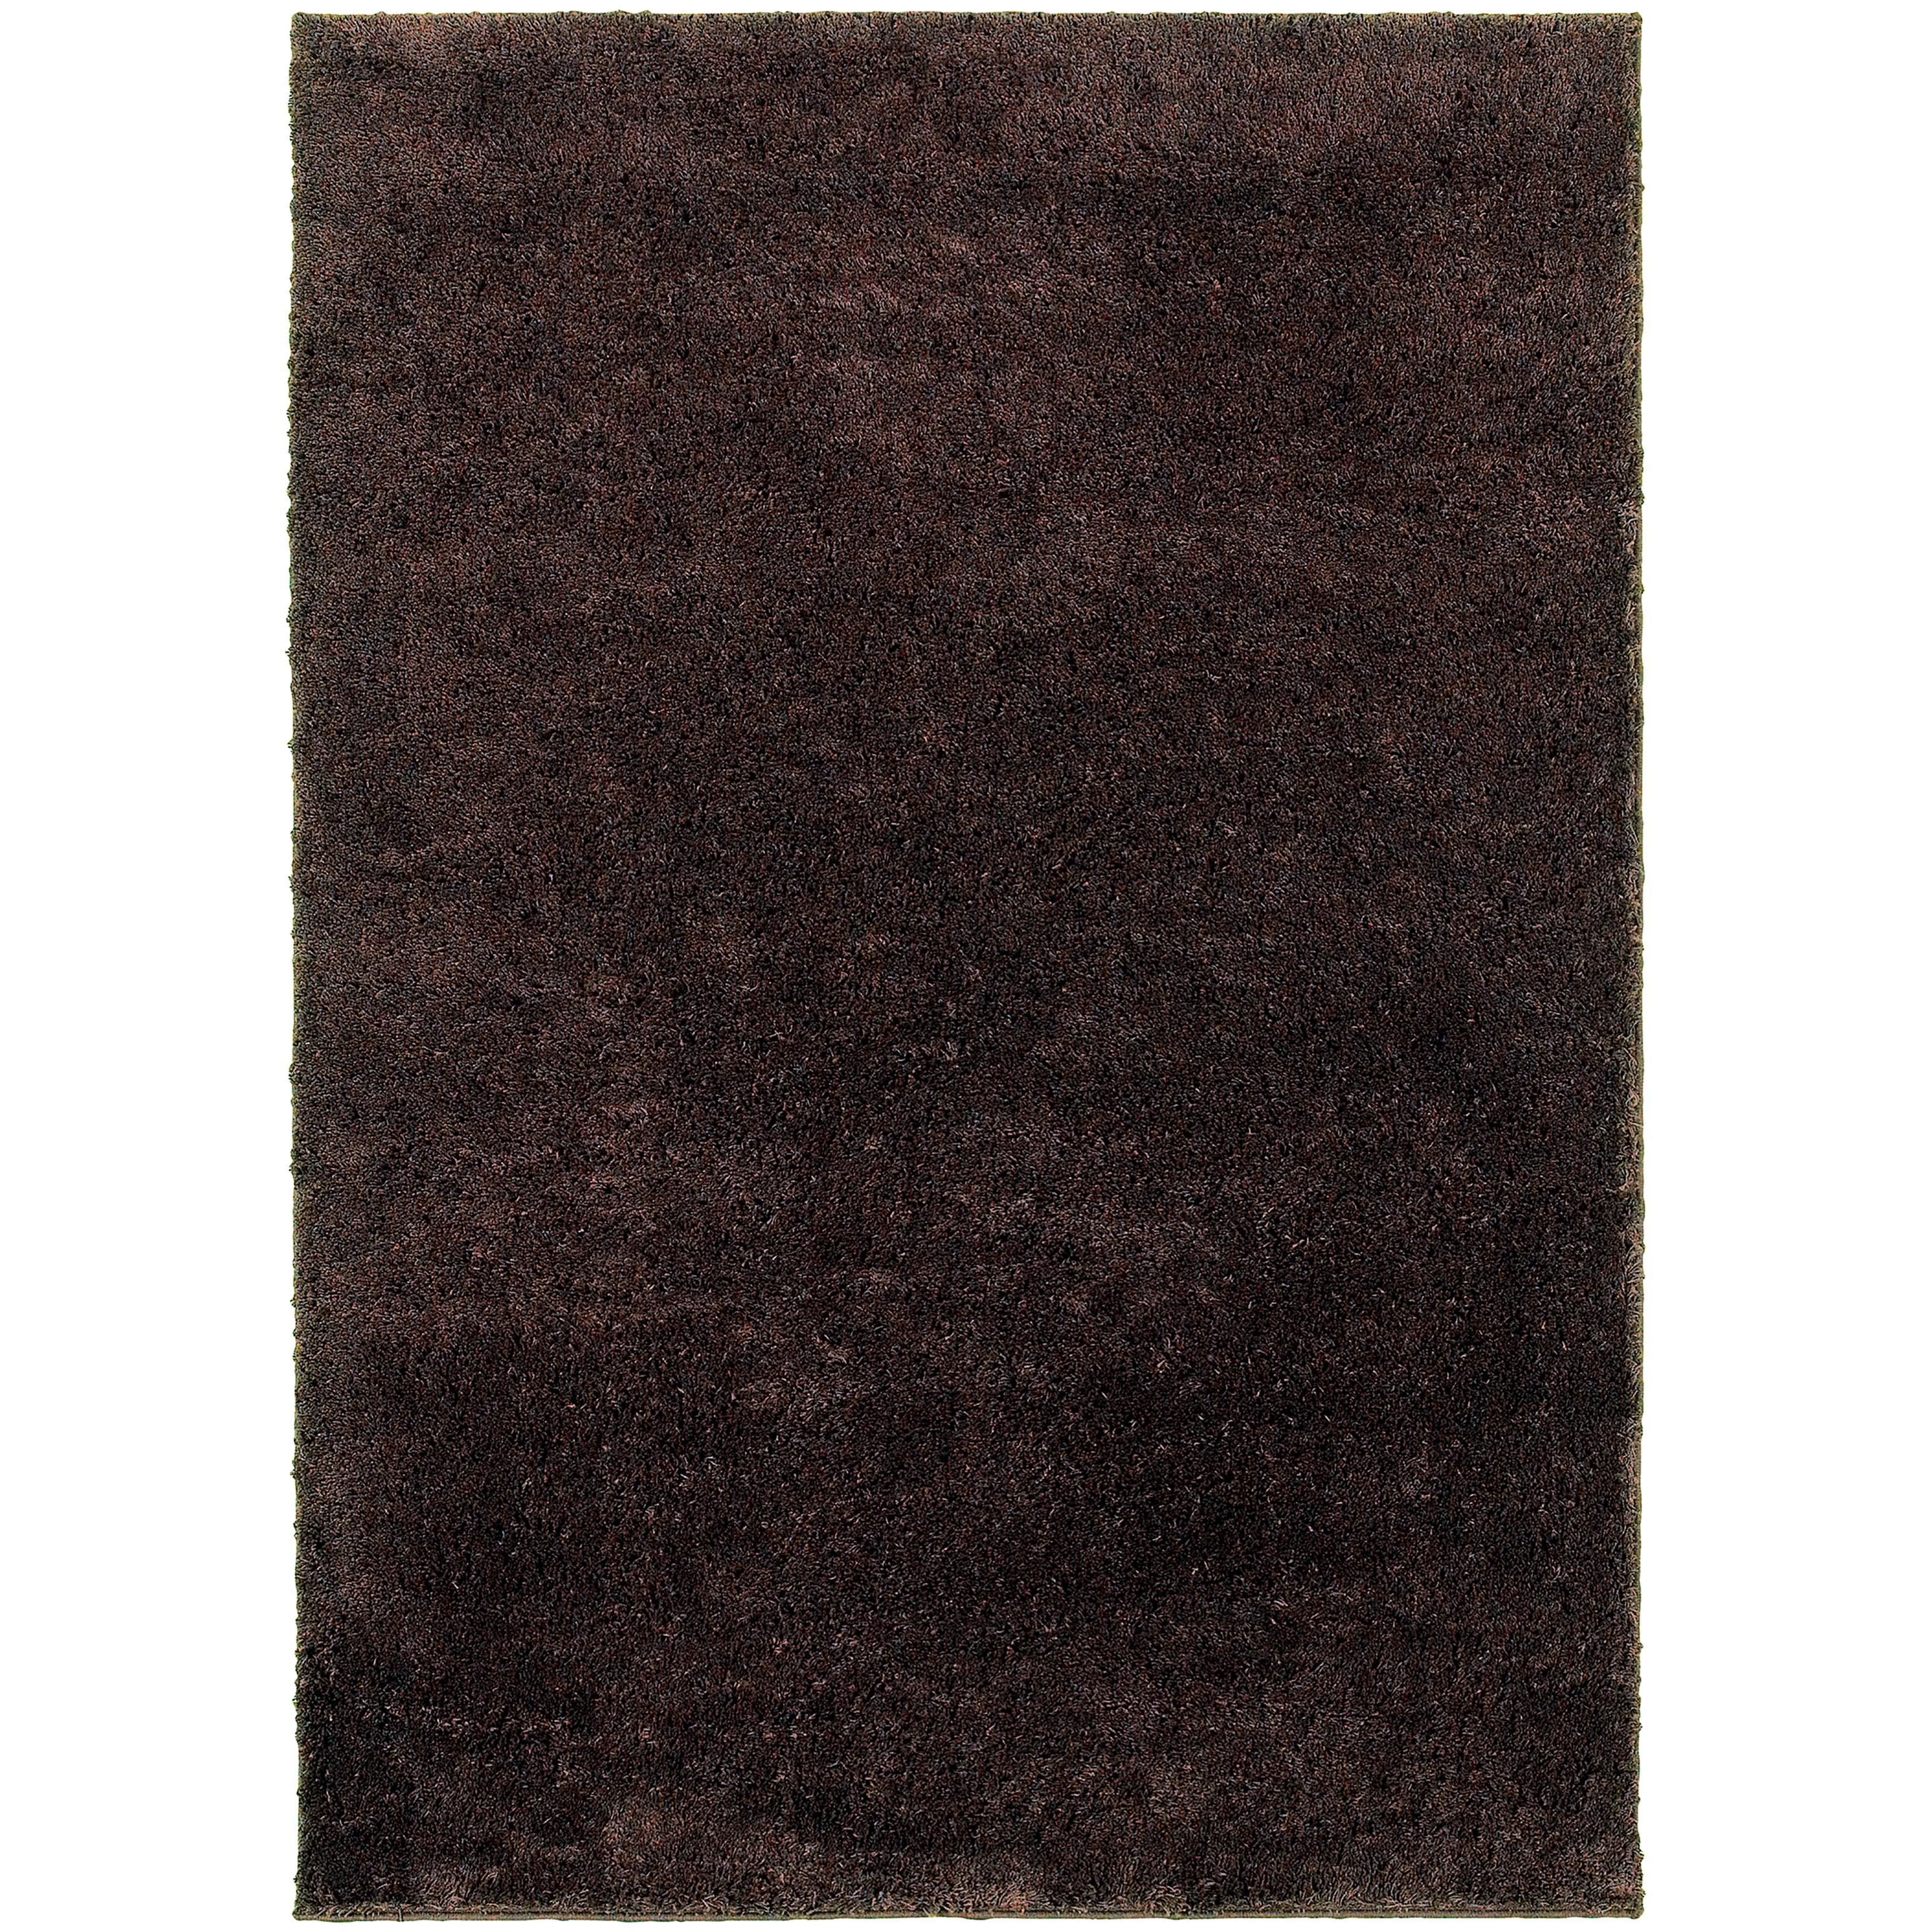 "Oriental Weavers Impressions 7'10"" X 10' 0"" Rug - Item Number: I84500240305ST"